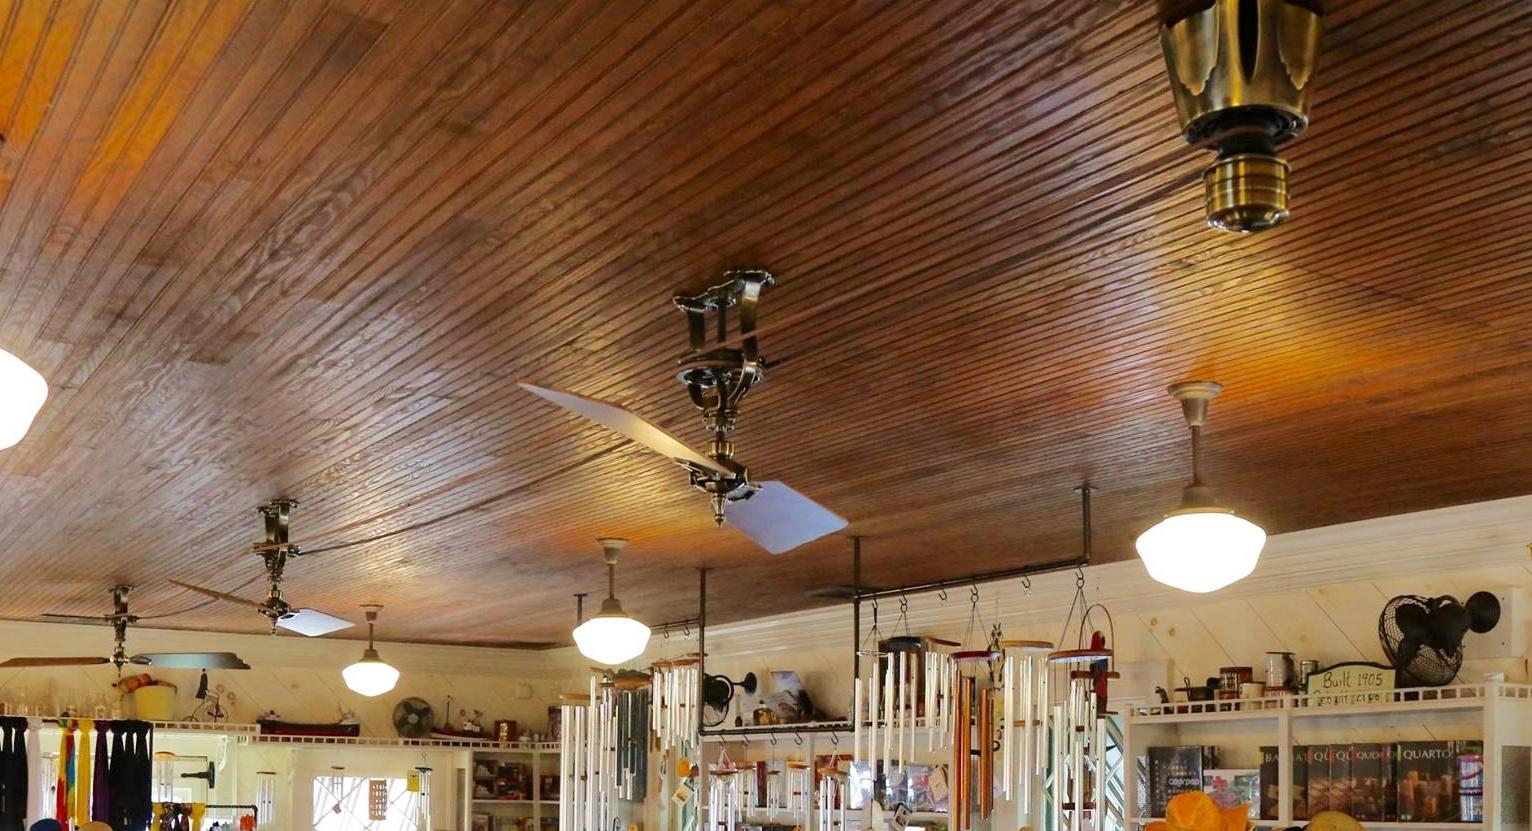 Vintage Ceiling Fan For Lakeside Historic Building Blog